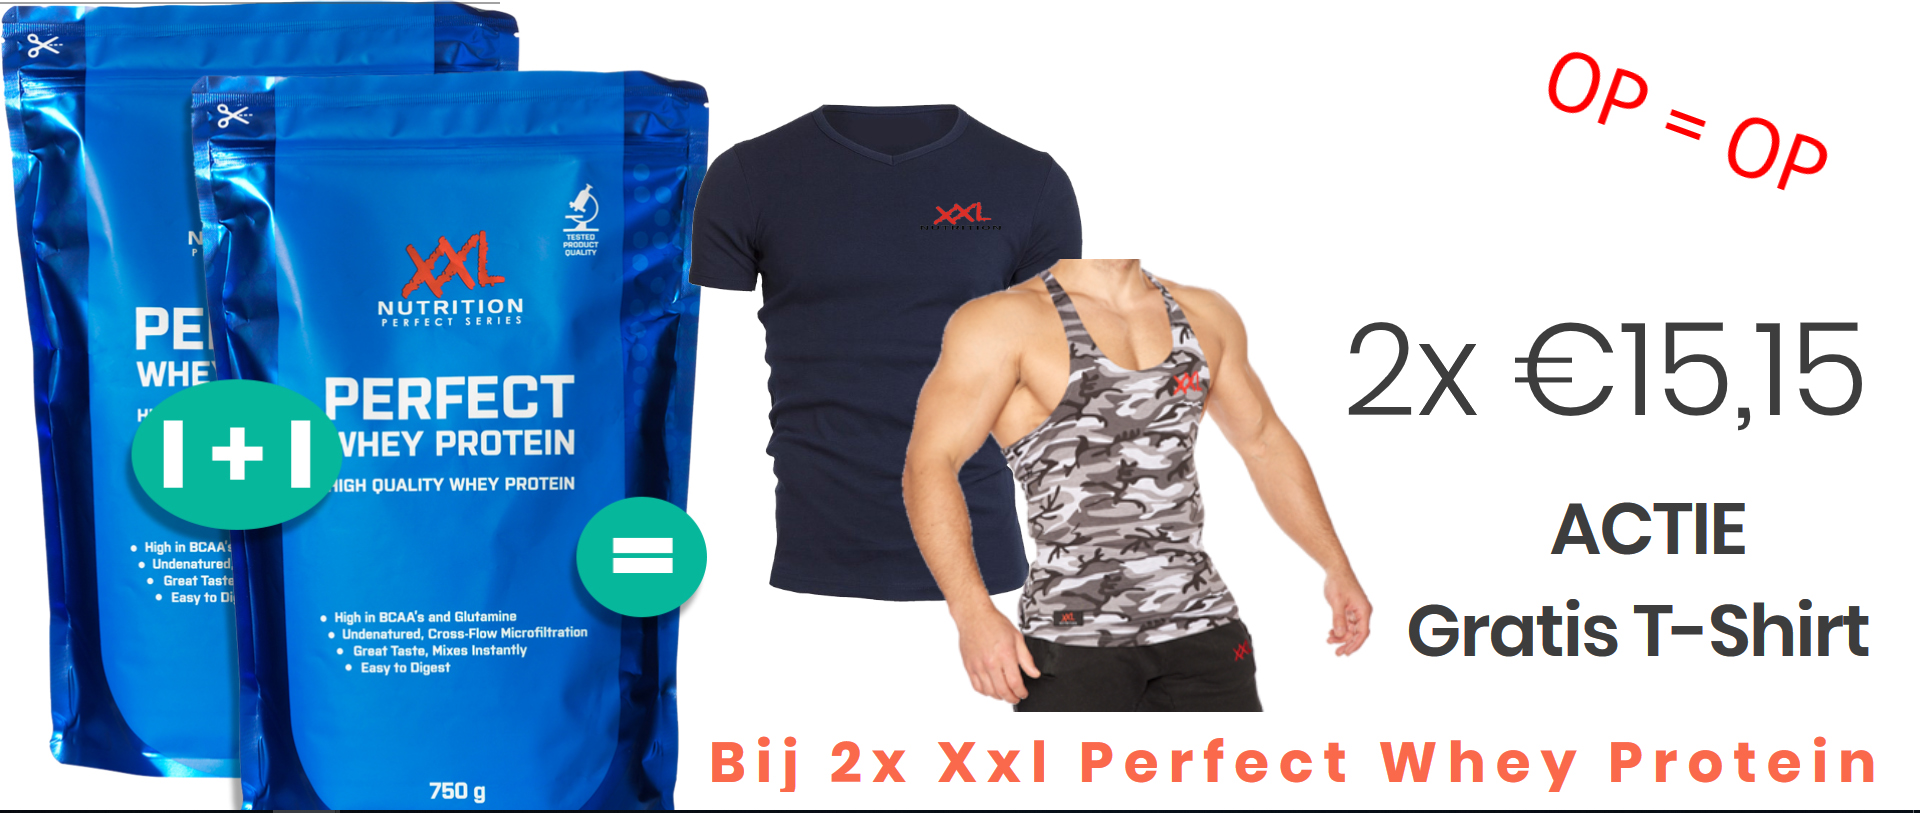 xxl-shirt actie 1